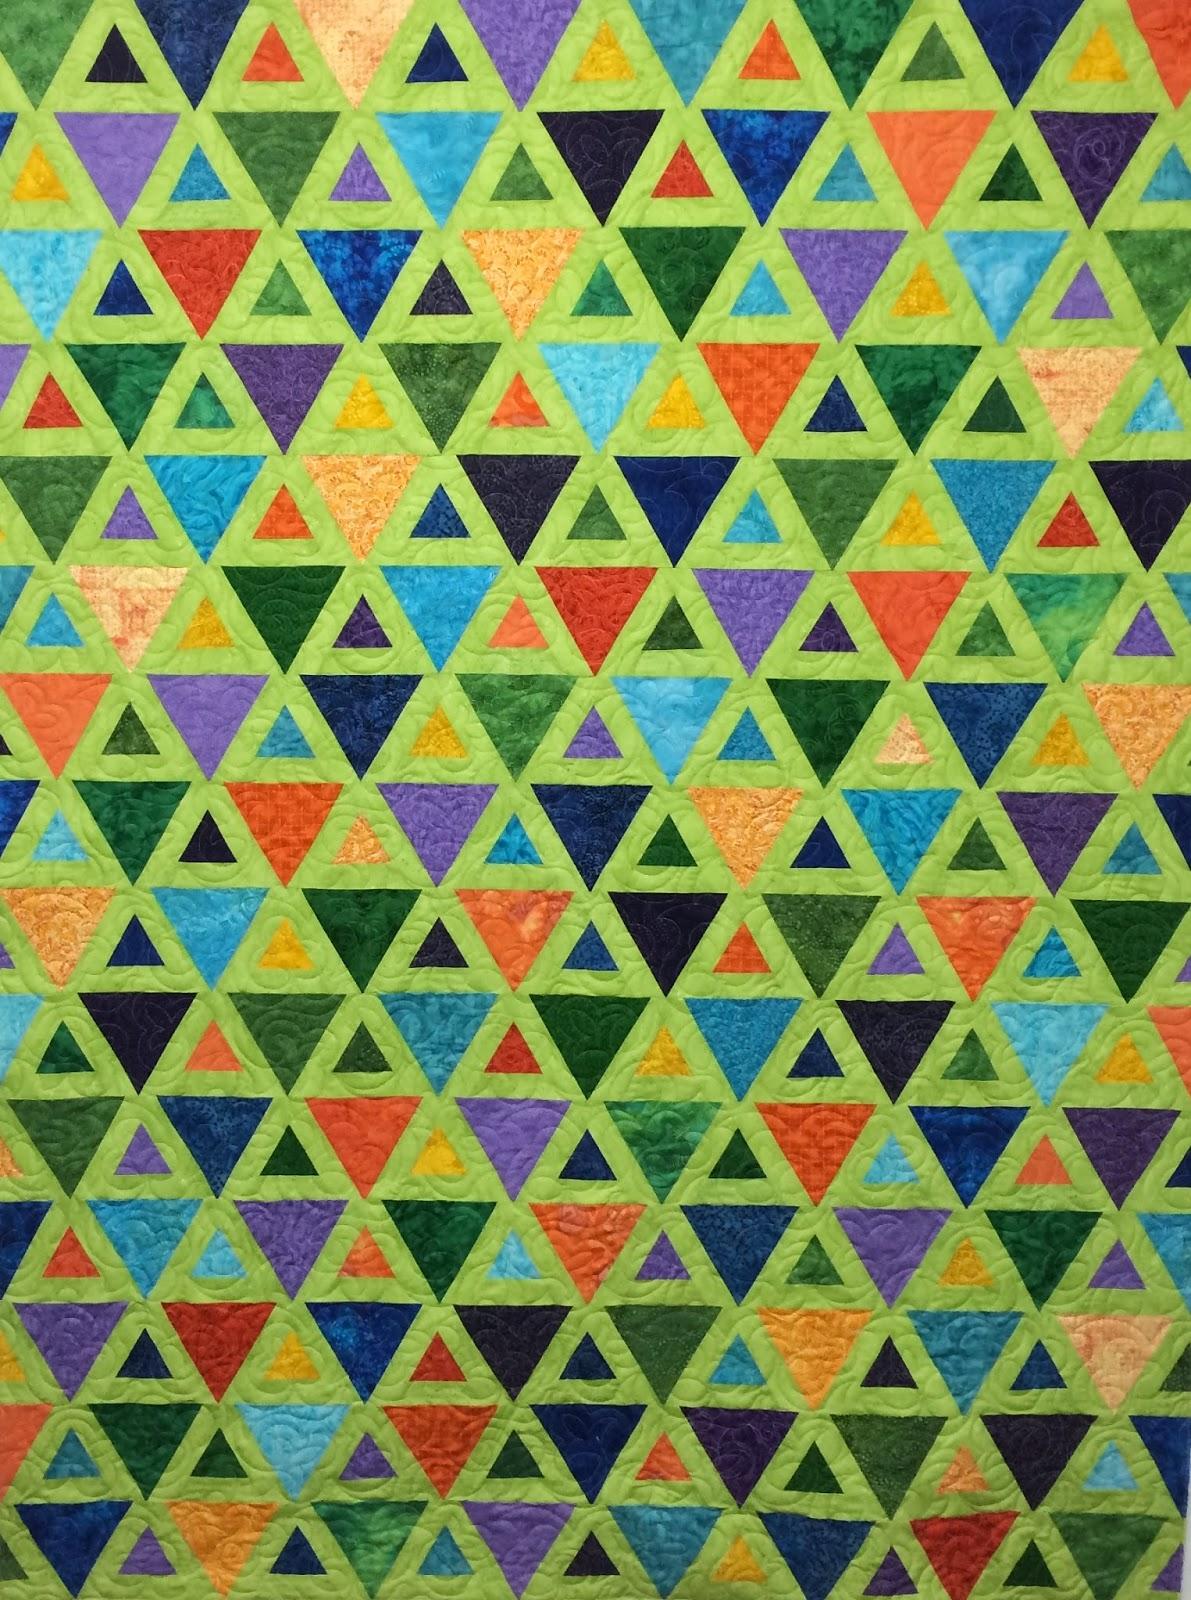 Kathy Ryan Grandson's Quilt